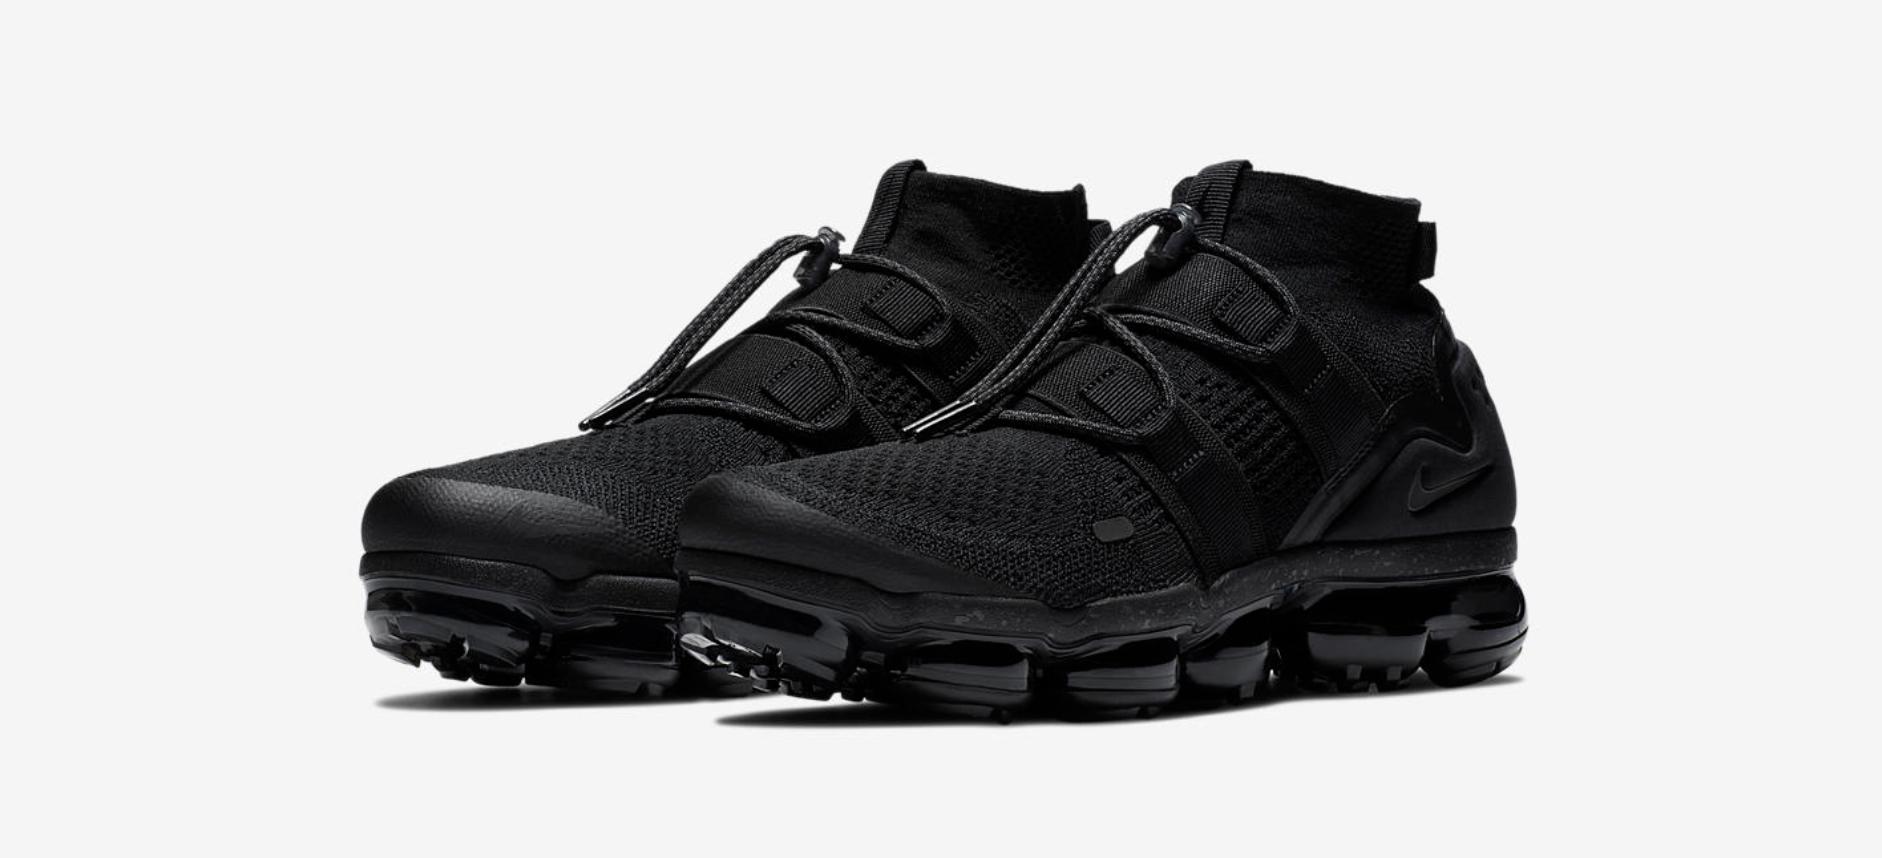 new product 7edec 10473 Nike Unveils the Air VaporMax Utility 'Maximum Black ...